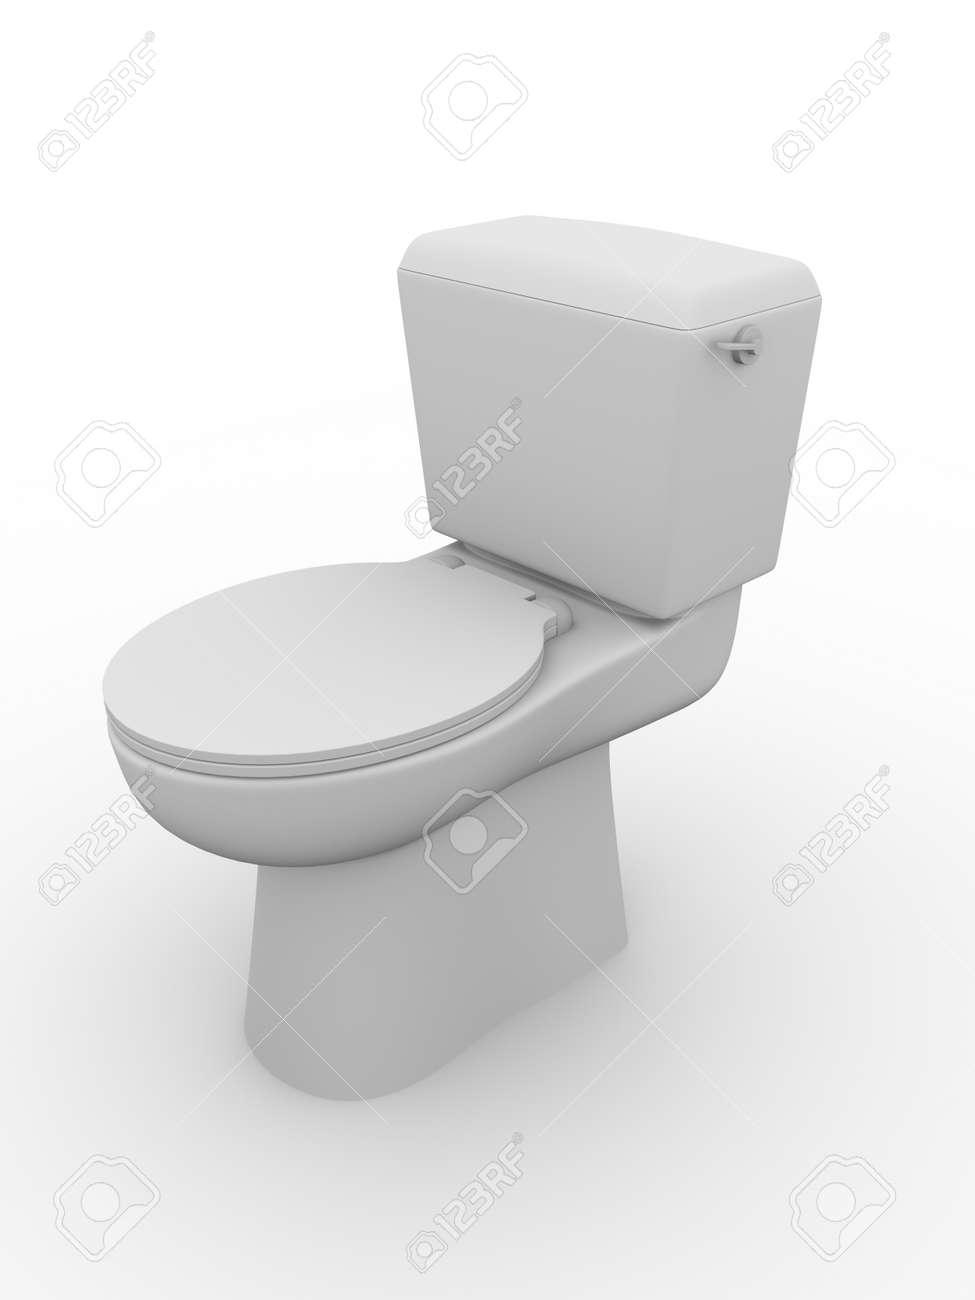 Super Closed Toilet Bowl Bathroom Equipment Water Closet Wc Theyellowbook Wood Chair Design Ideas Theyellowbookinfo